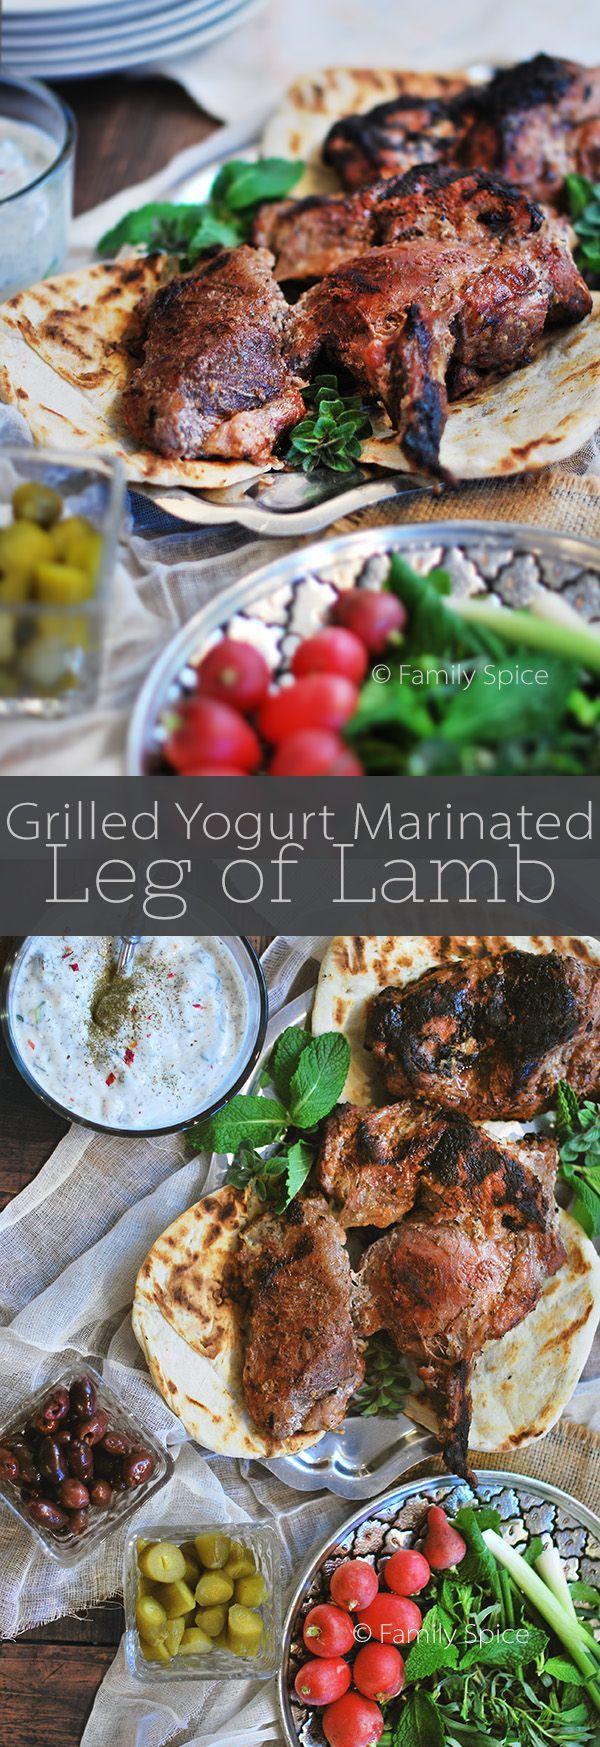 Grilled Yogurt Marinated Leg of Lamb by FamilySpice.com